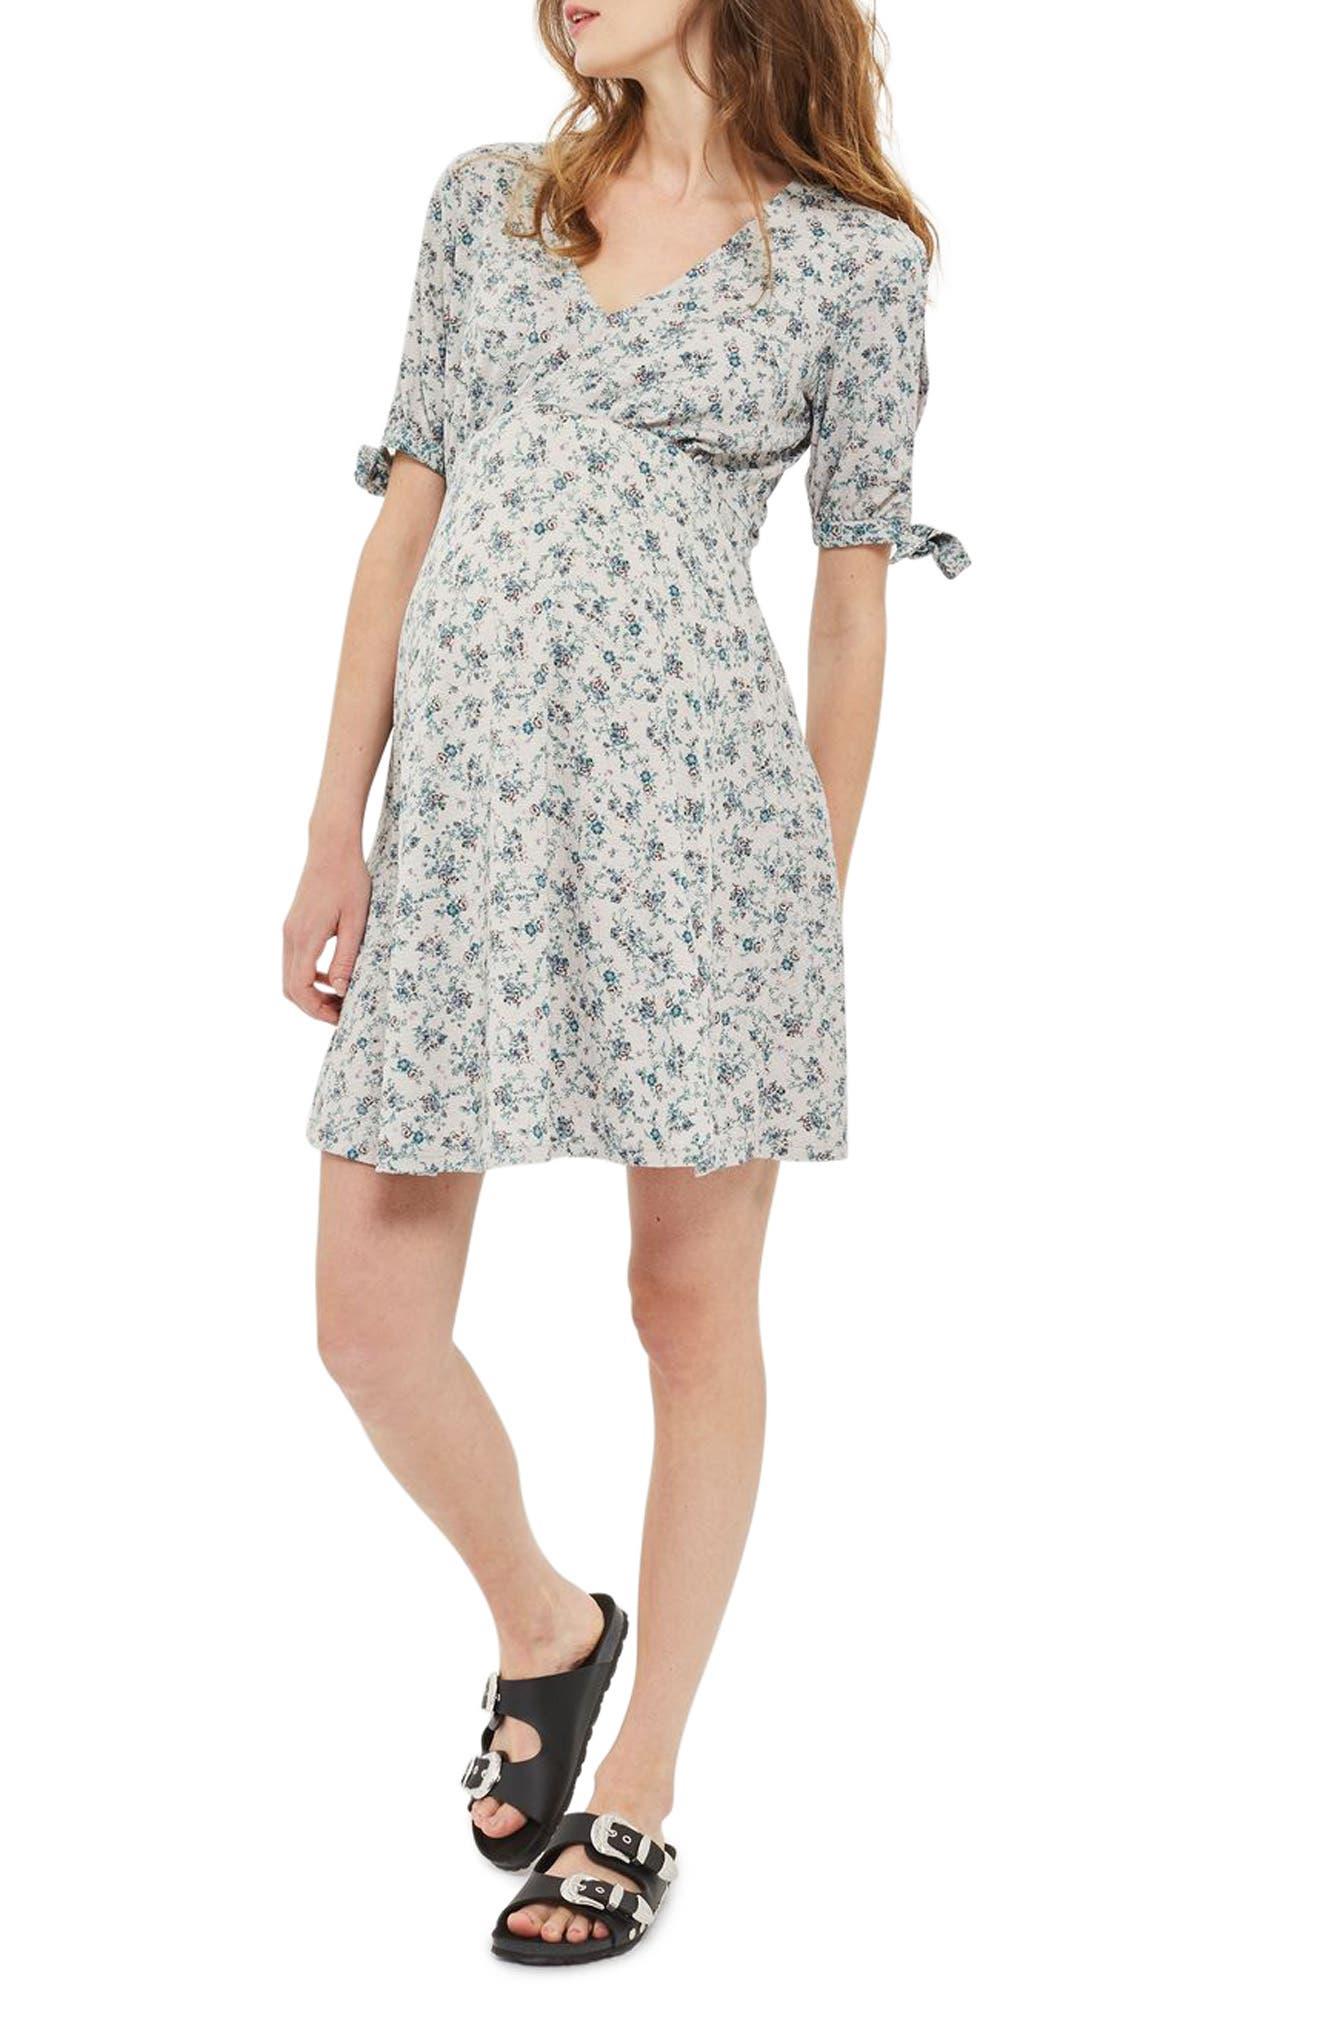 Topshop Floral Maternity Tea Dress